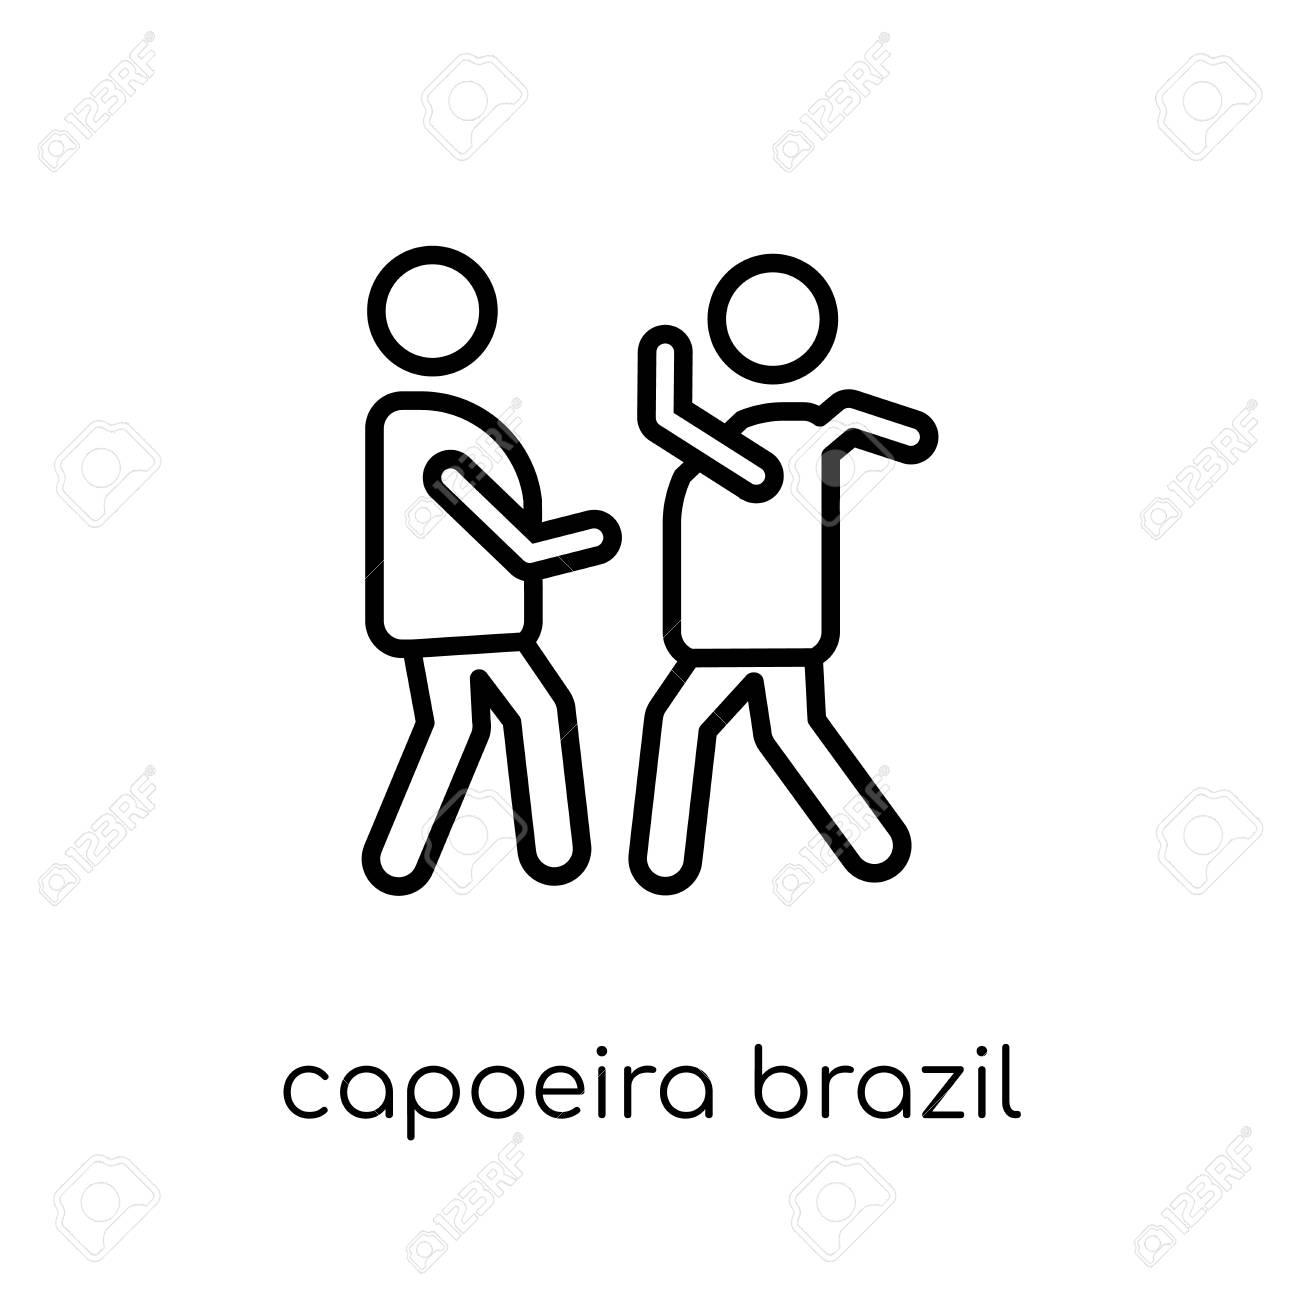 Capoeira dating indisk kultur vs amerikansk kultur Dating